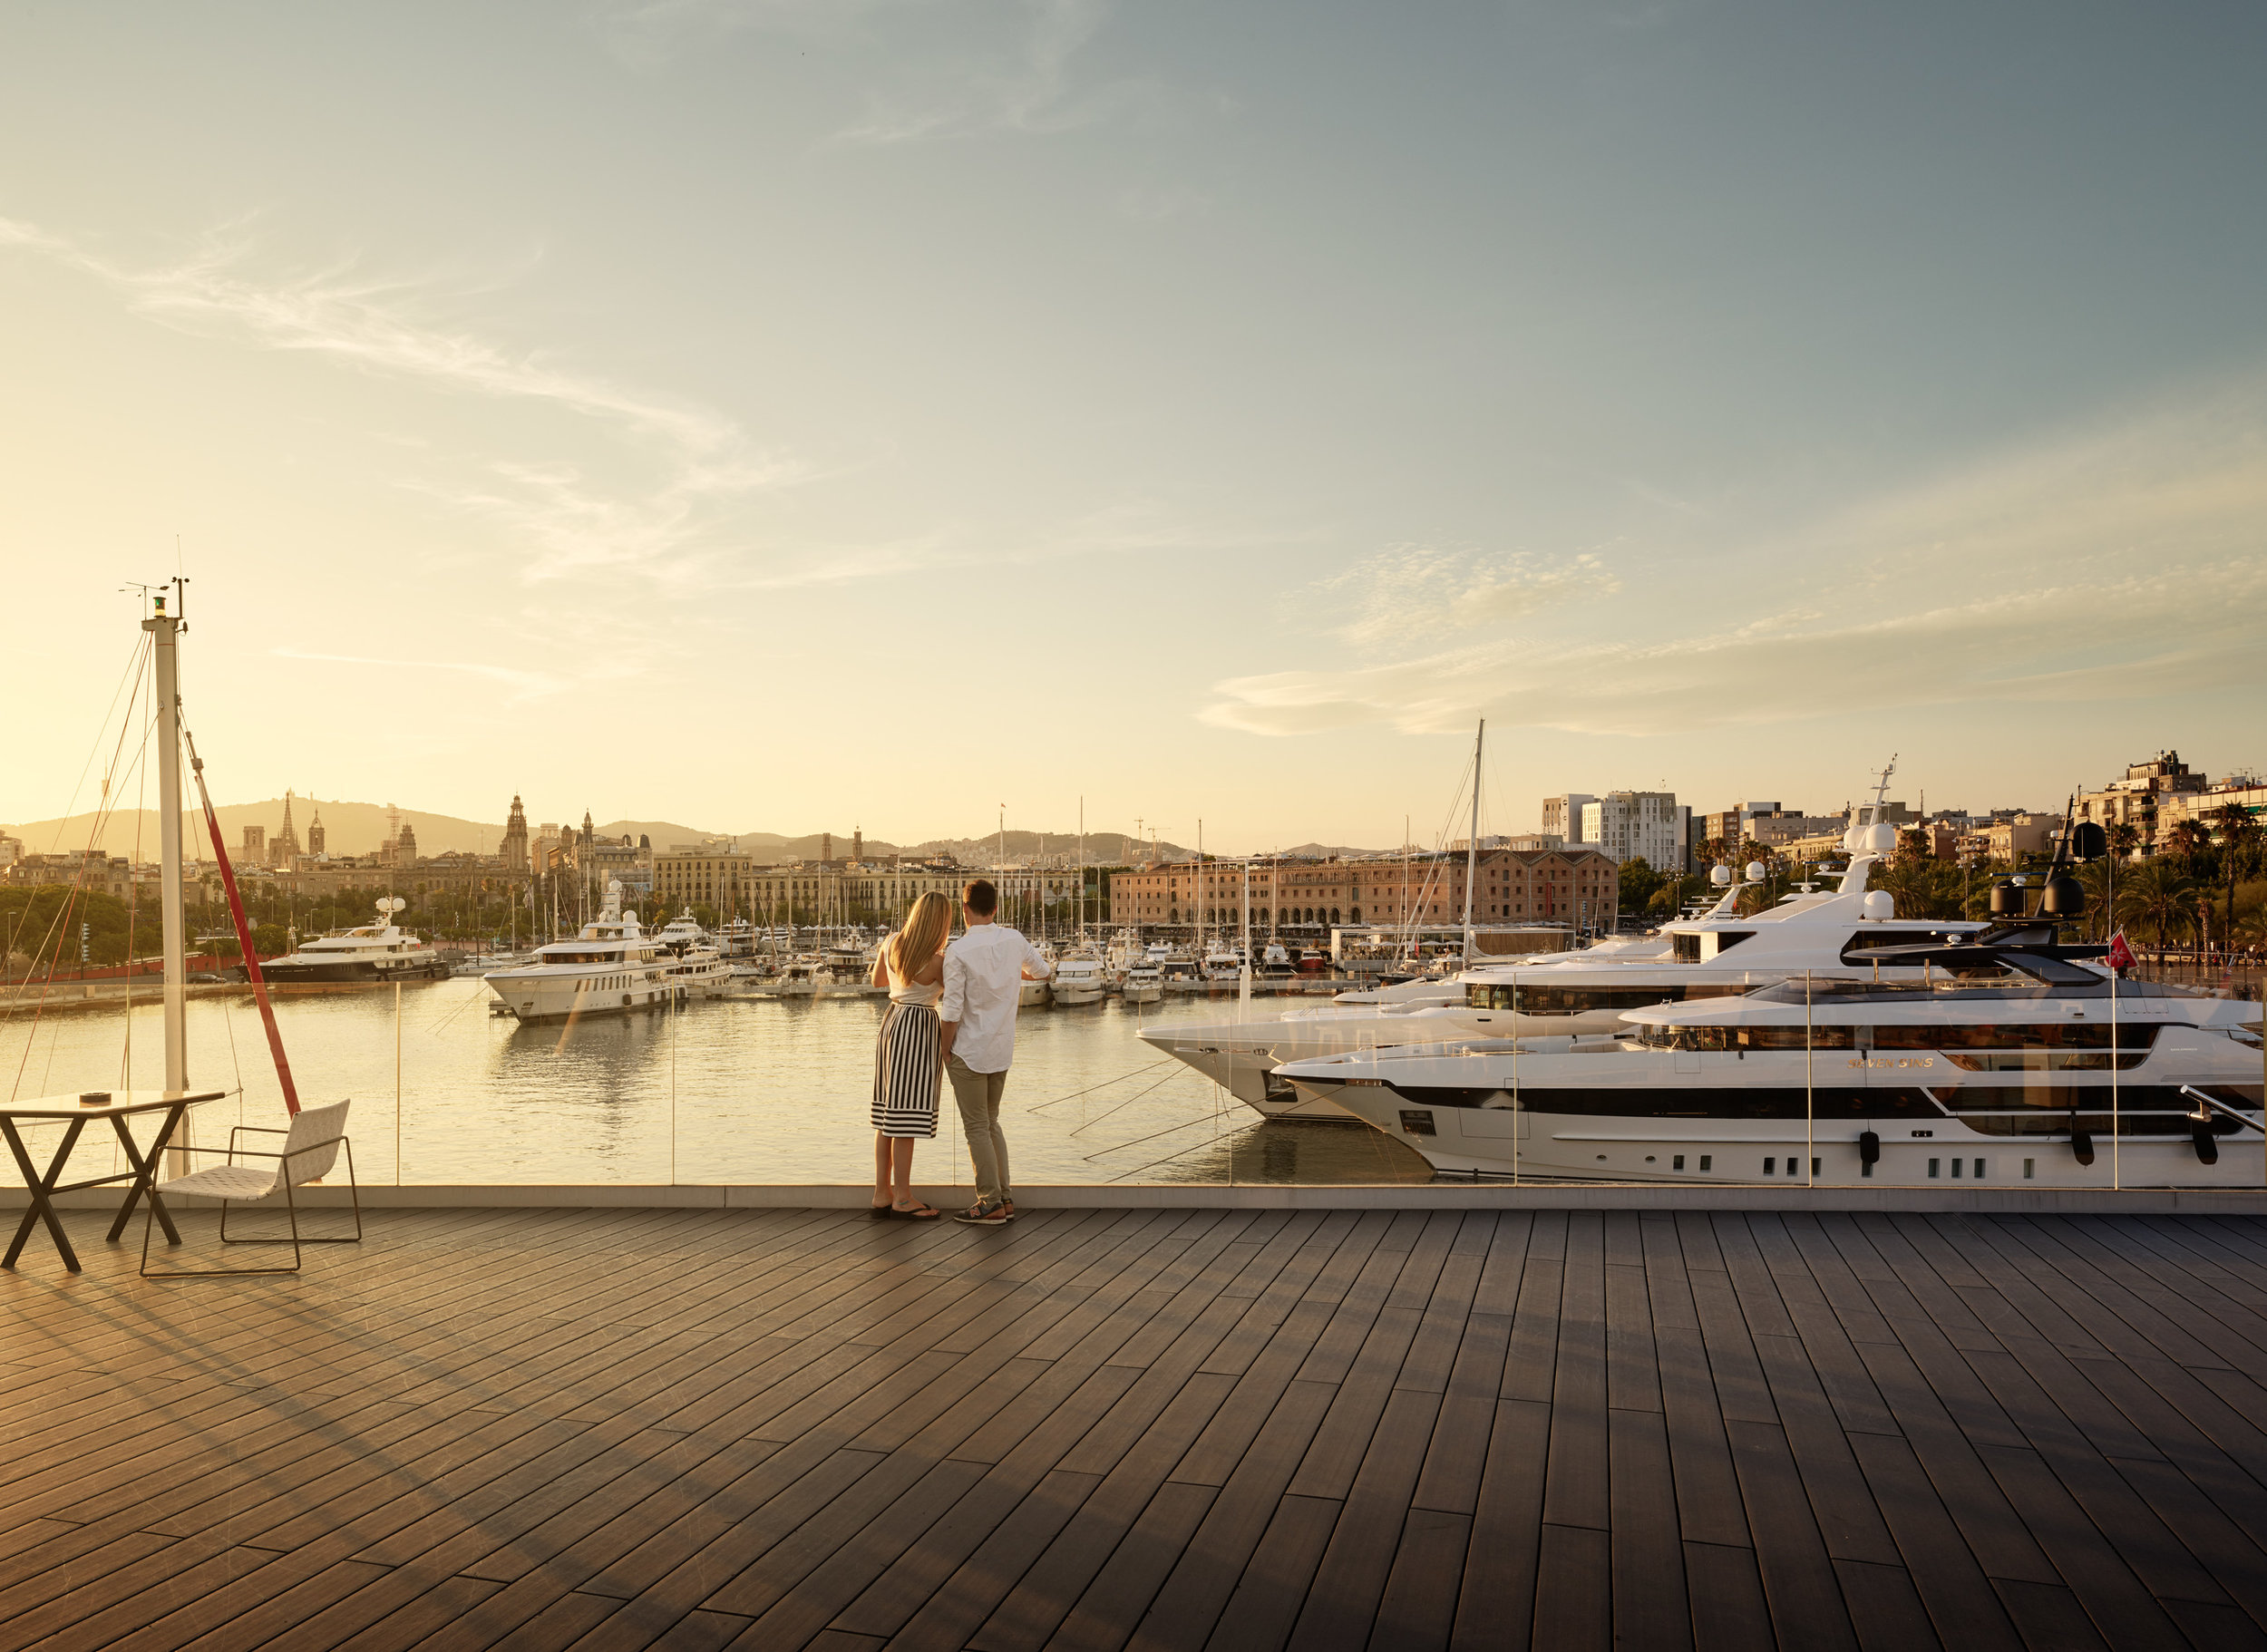 Marina-Rooftop-copy.jpg